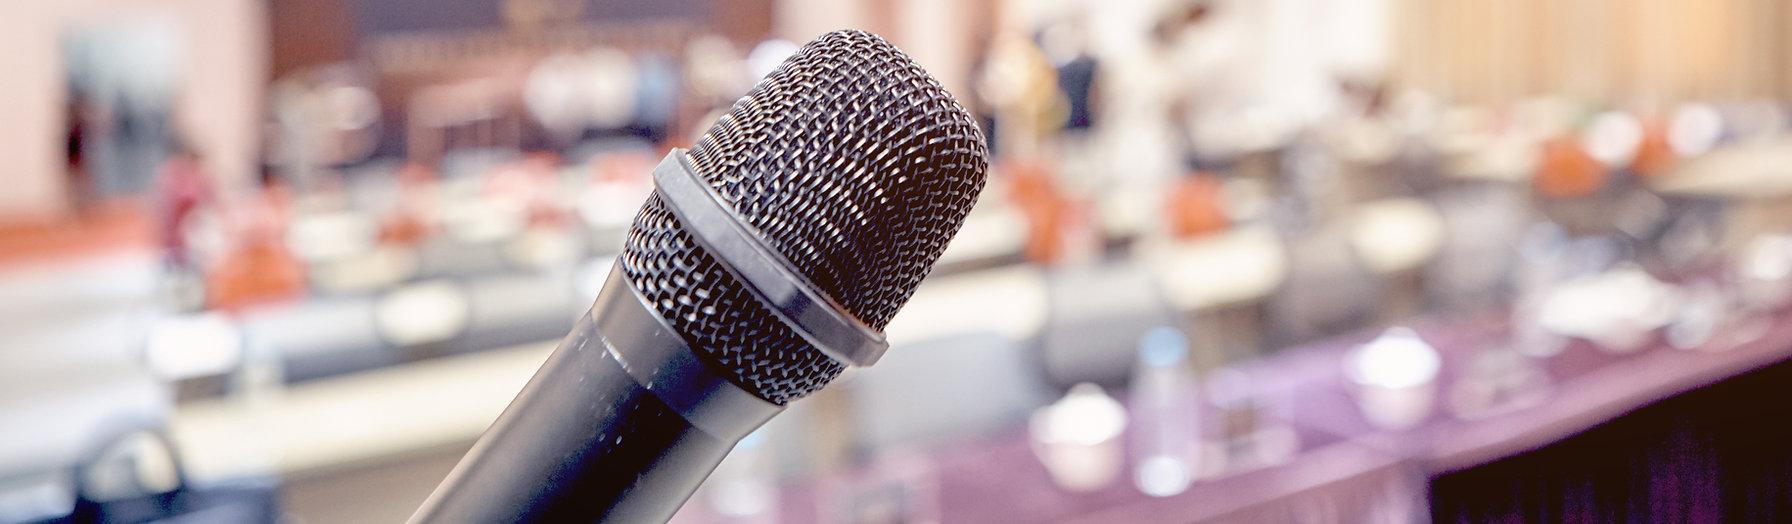 iStock-580105716 - microphone.jpg